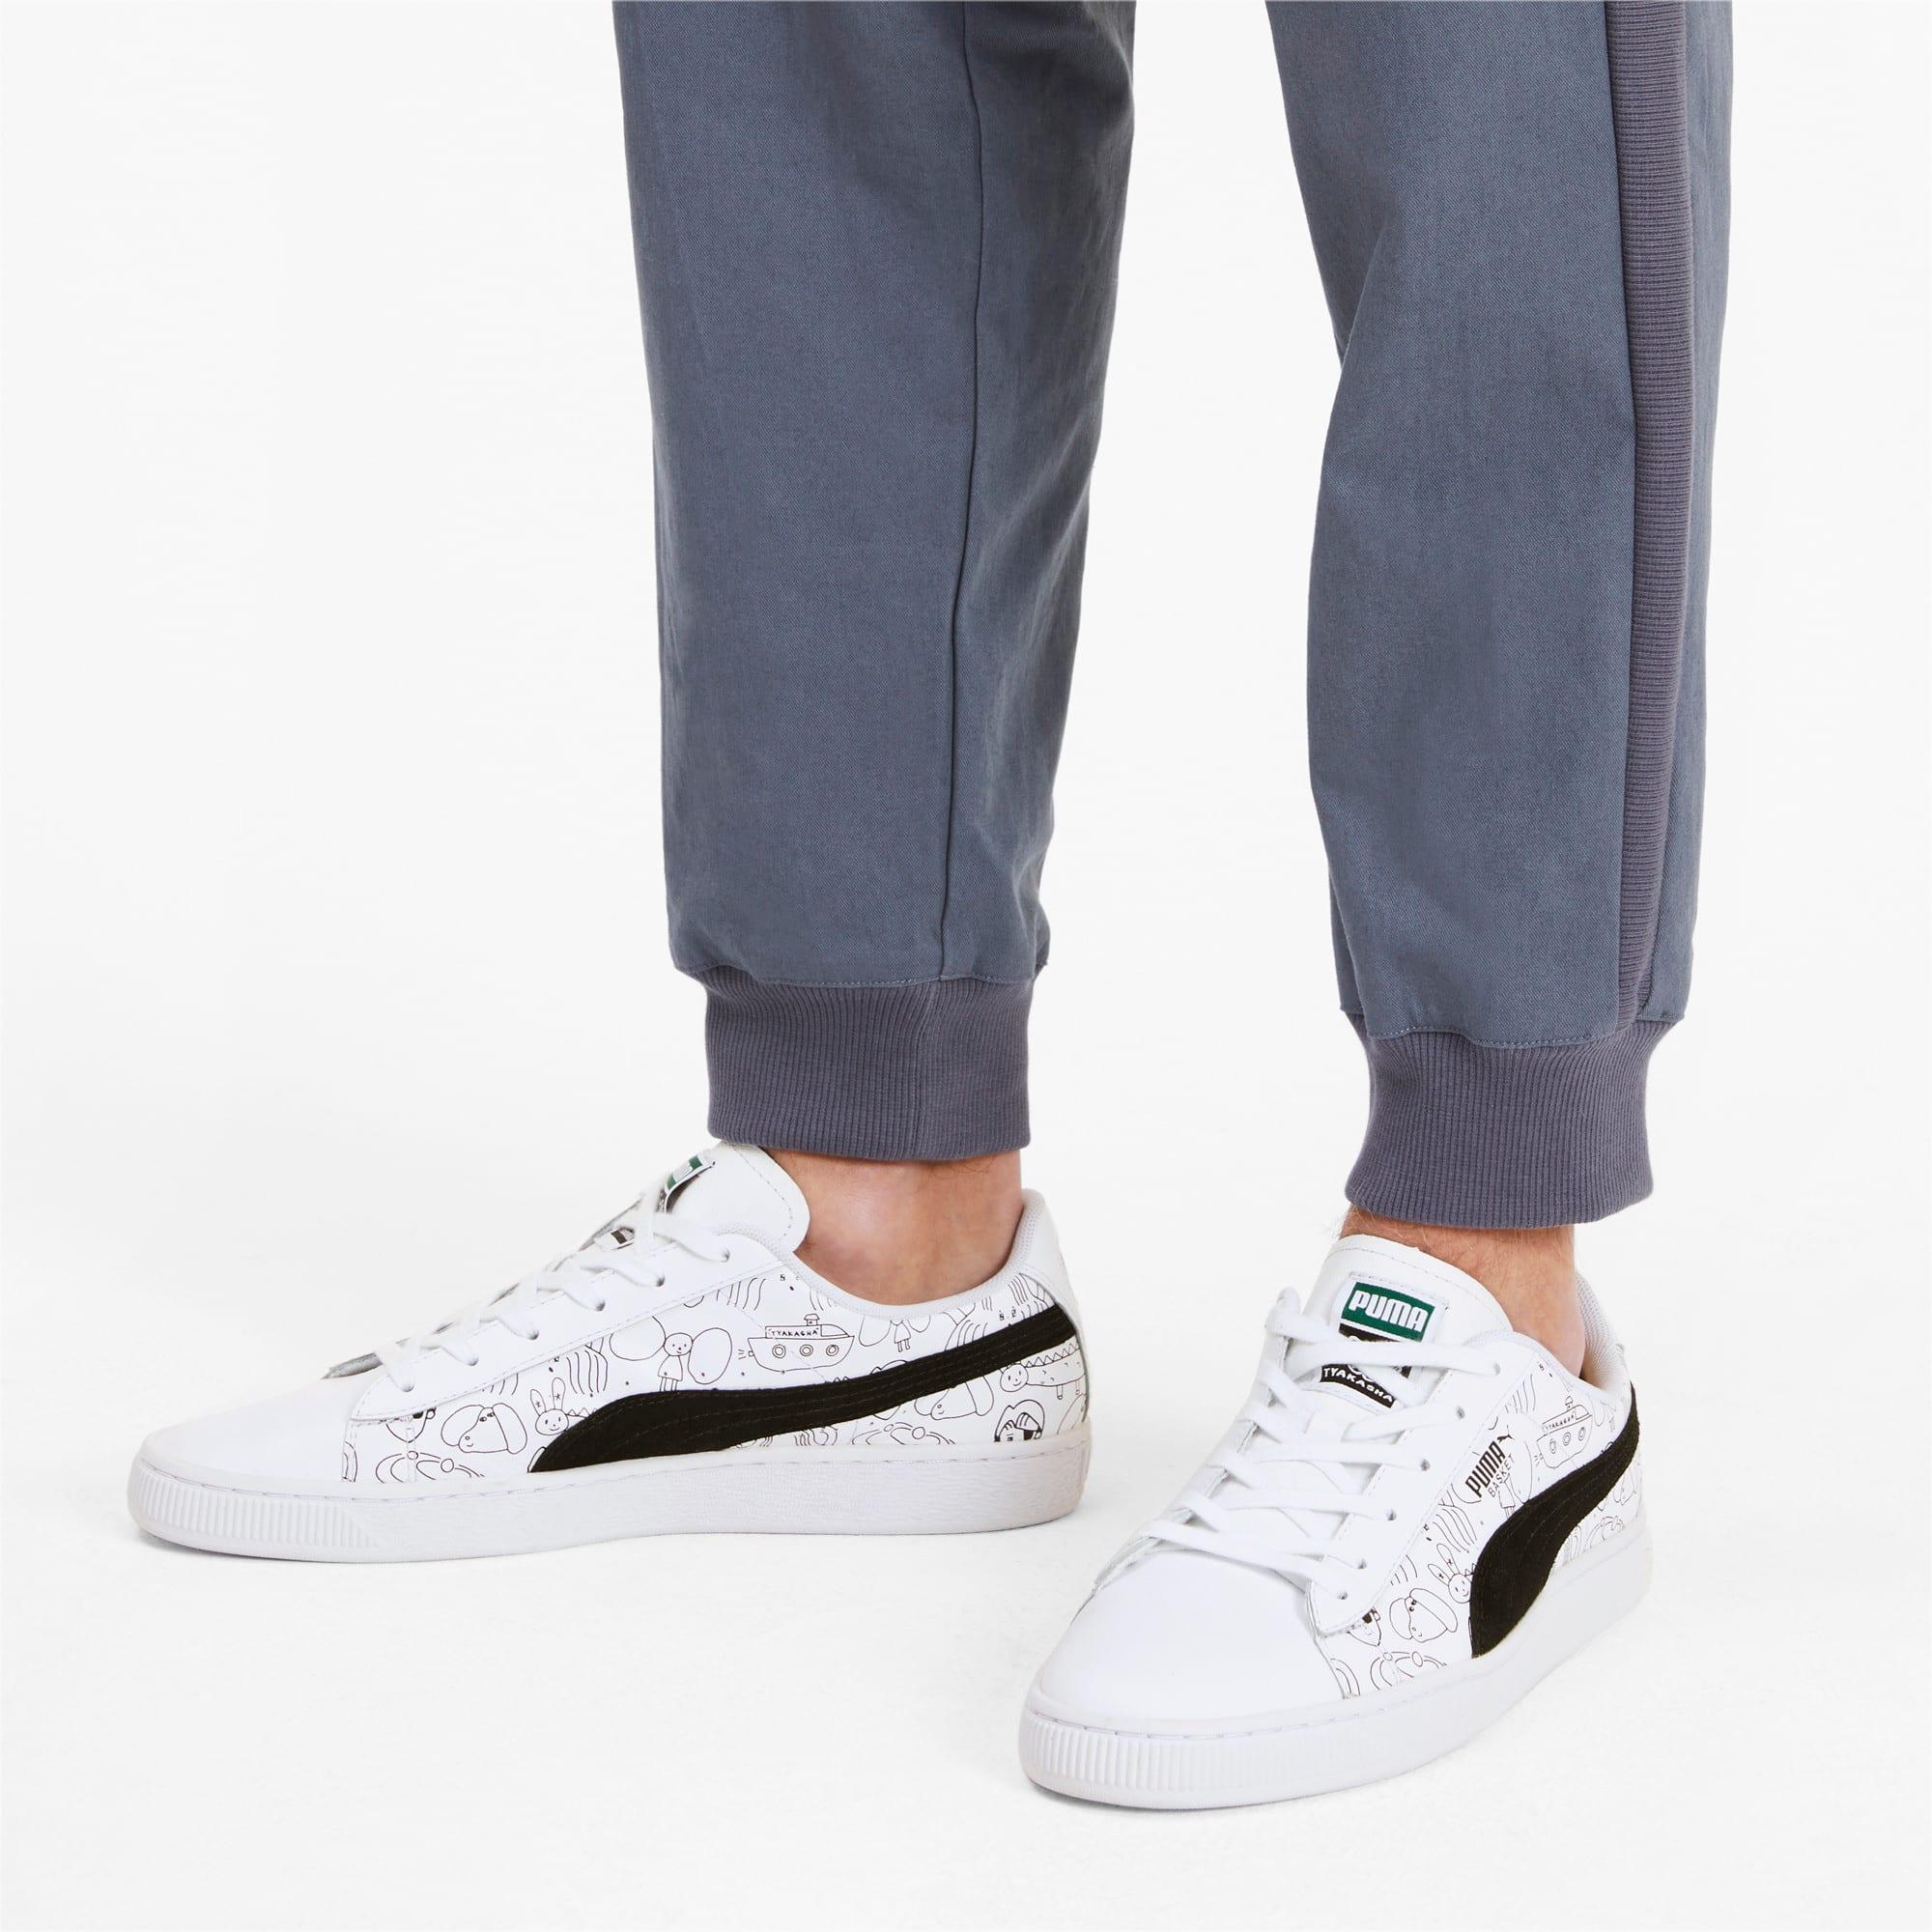 Thumbnail 2 of PUMA x TYAKASHA Basket Sneakers, Puma White-Puma Black, medium